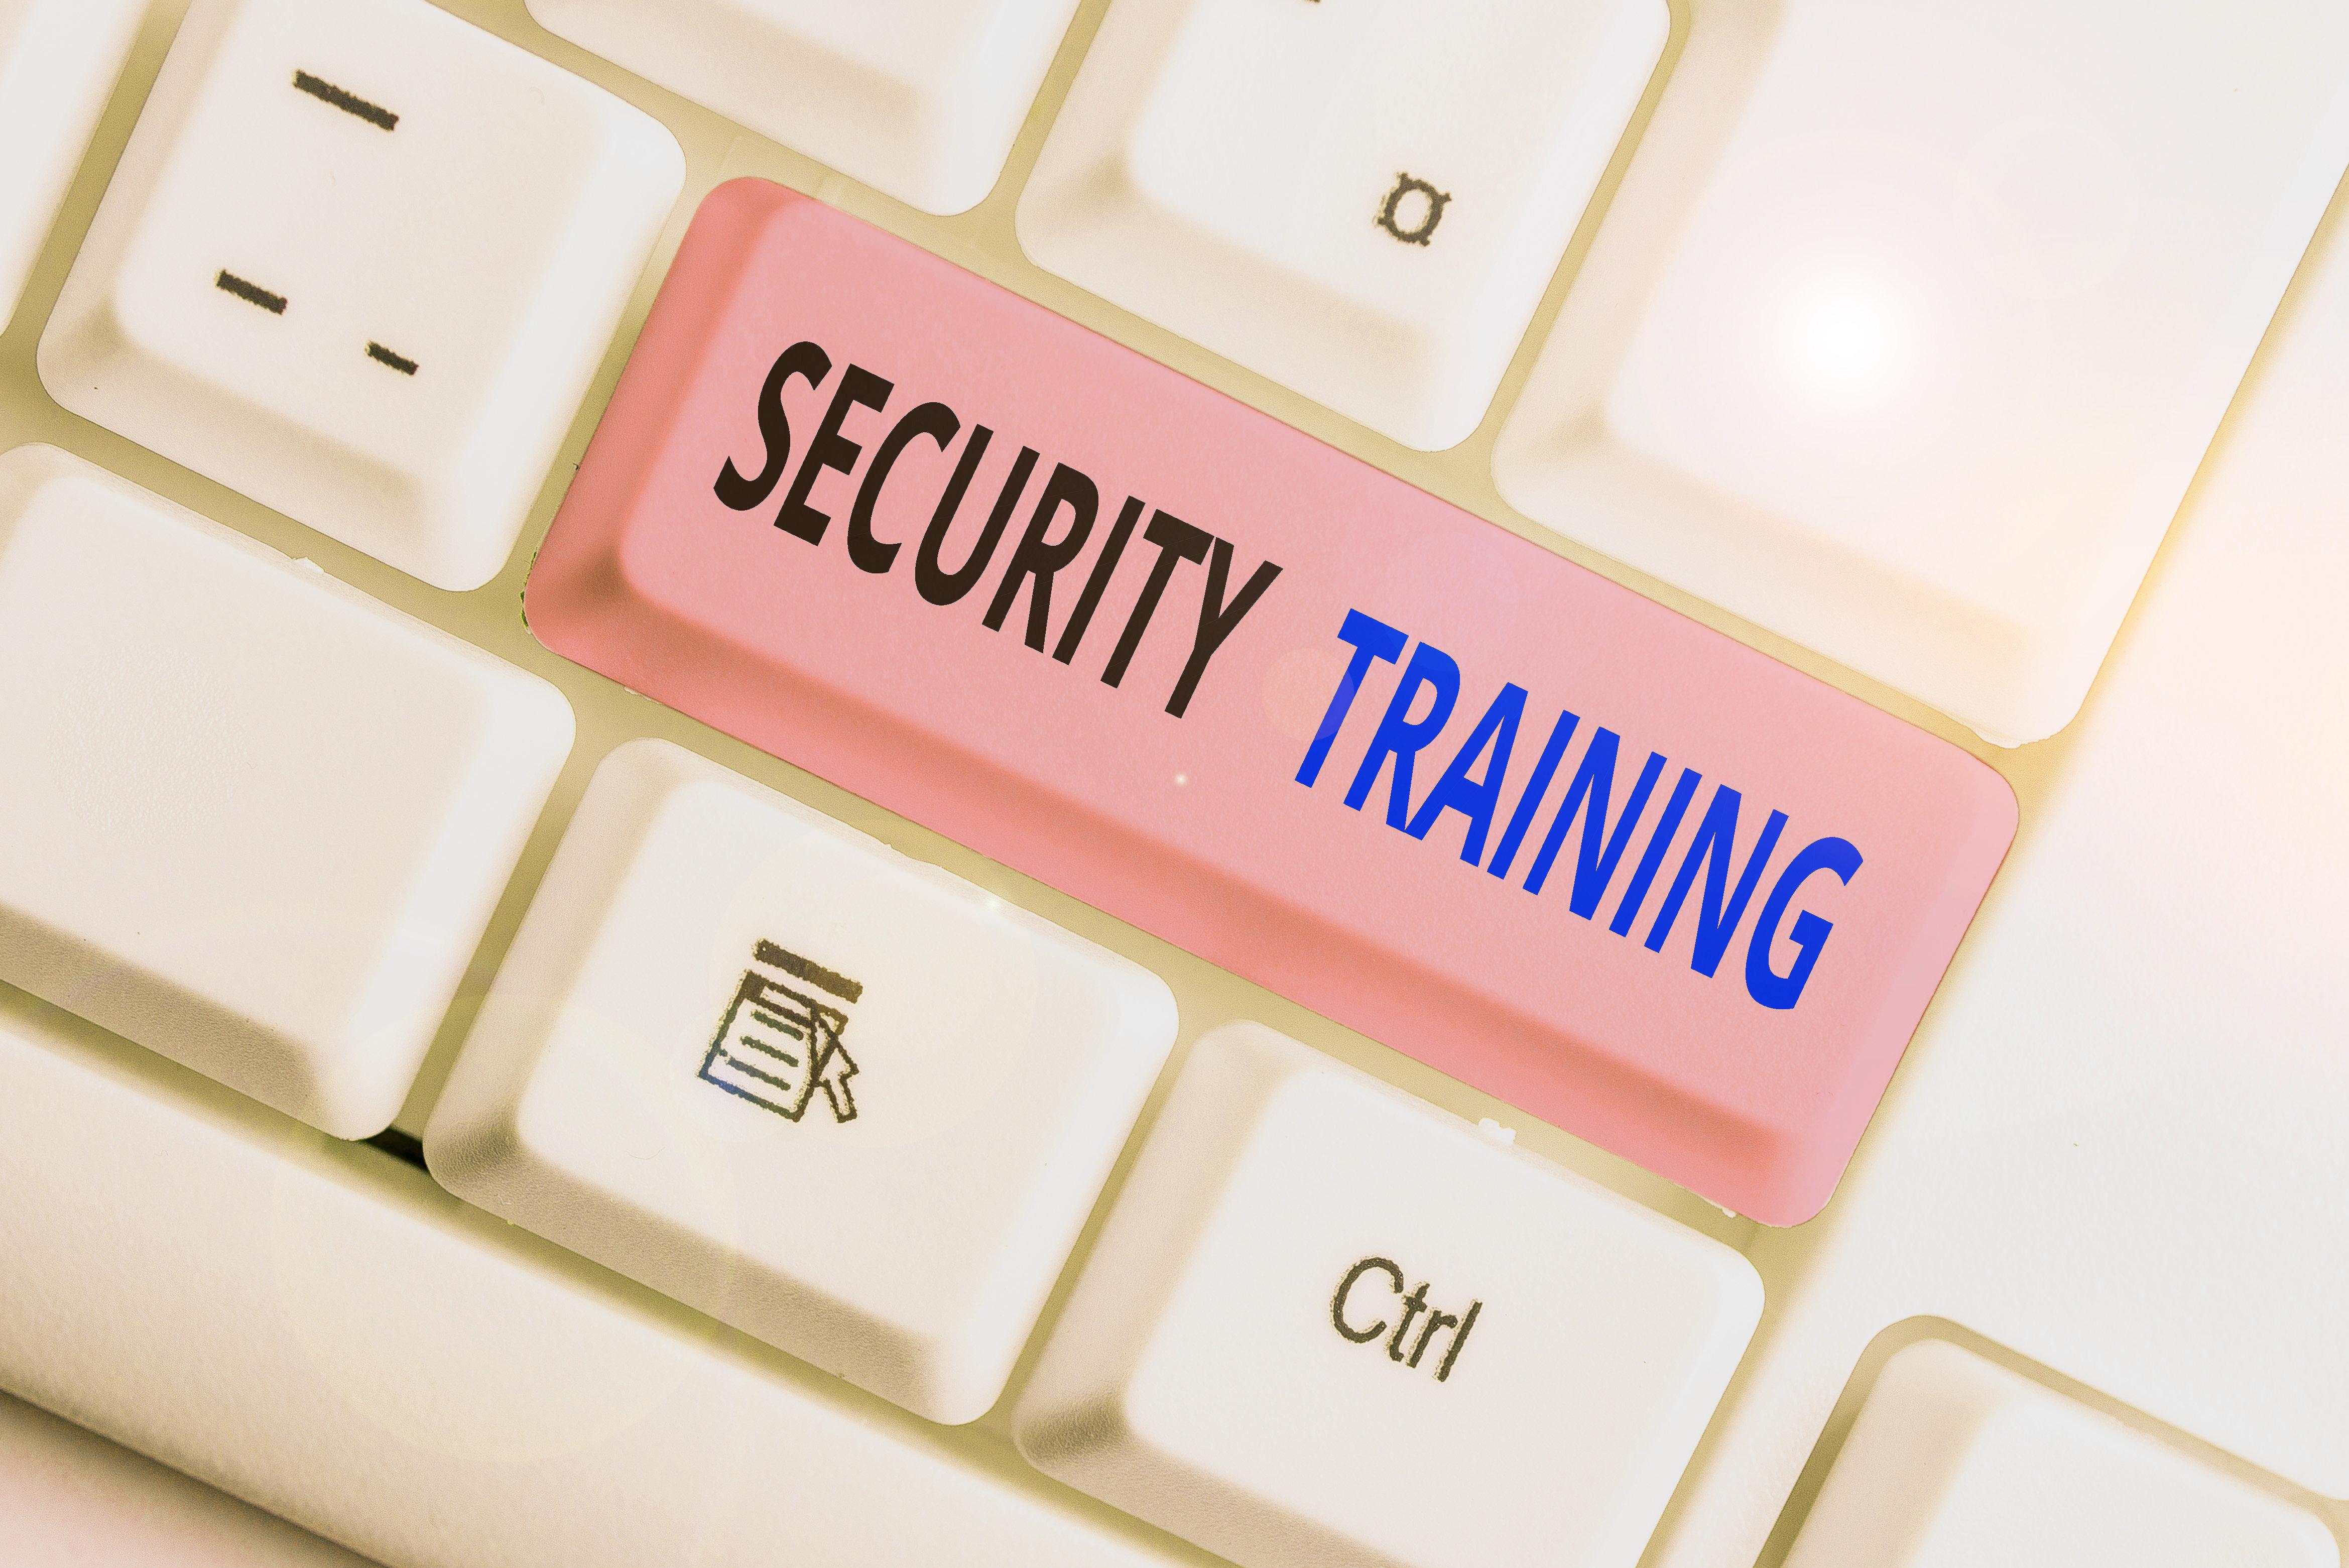 https://0201.nccdn.net/1_2/000/000/161/f9e/security-training--bst--basic-security.jpg